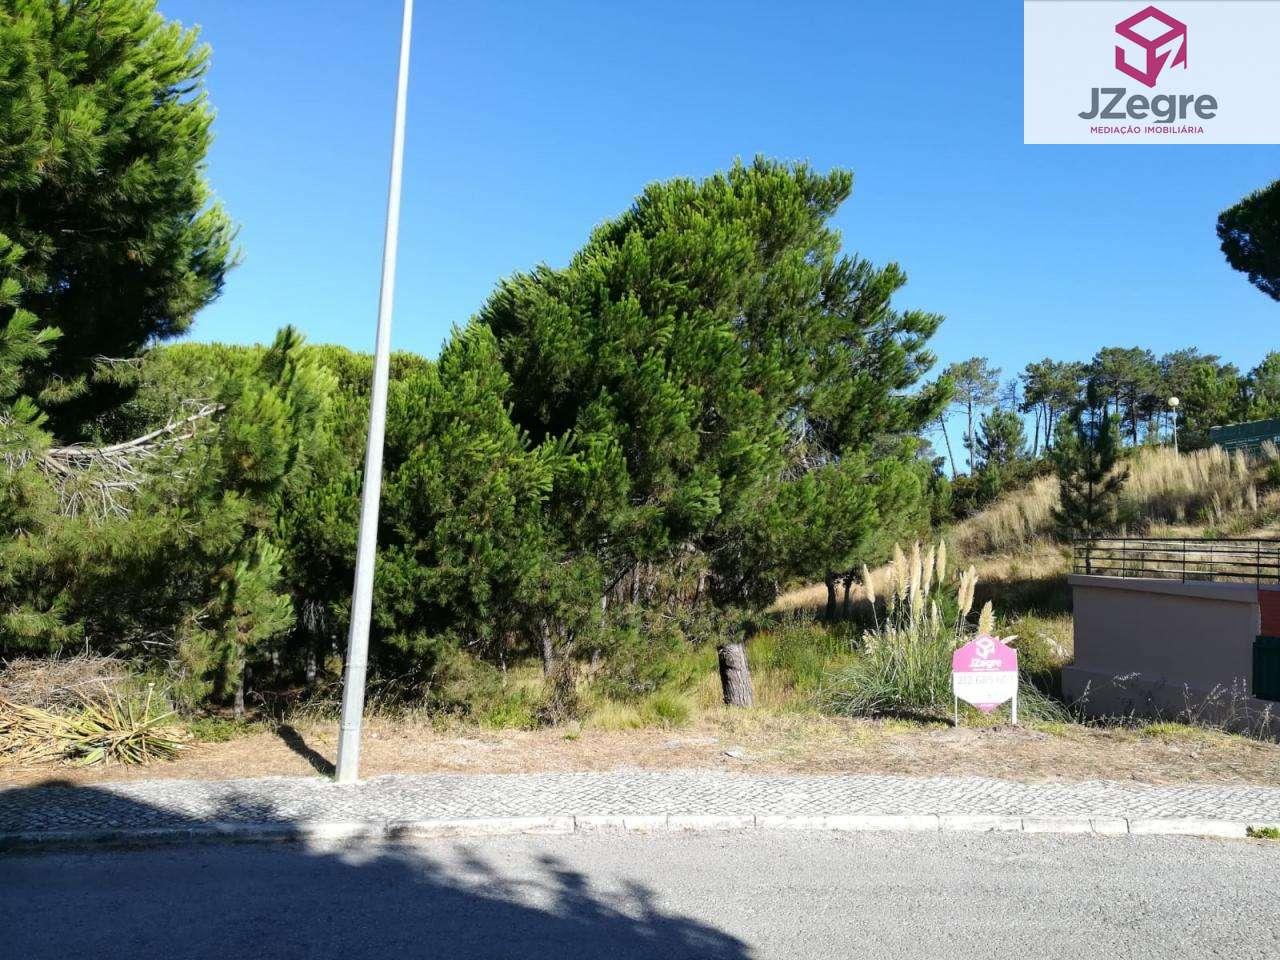 Terreno para comprar, Castelo (Sesimbra), Setúbal - Foto 2